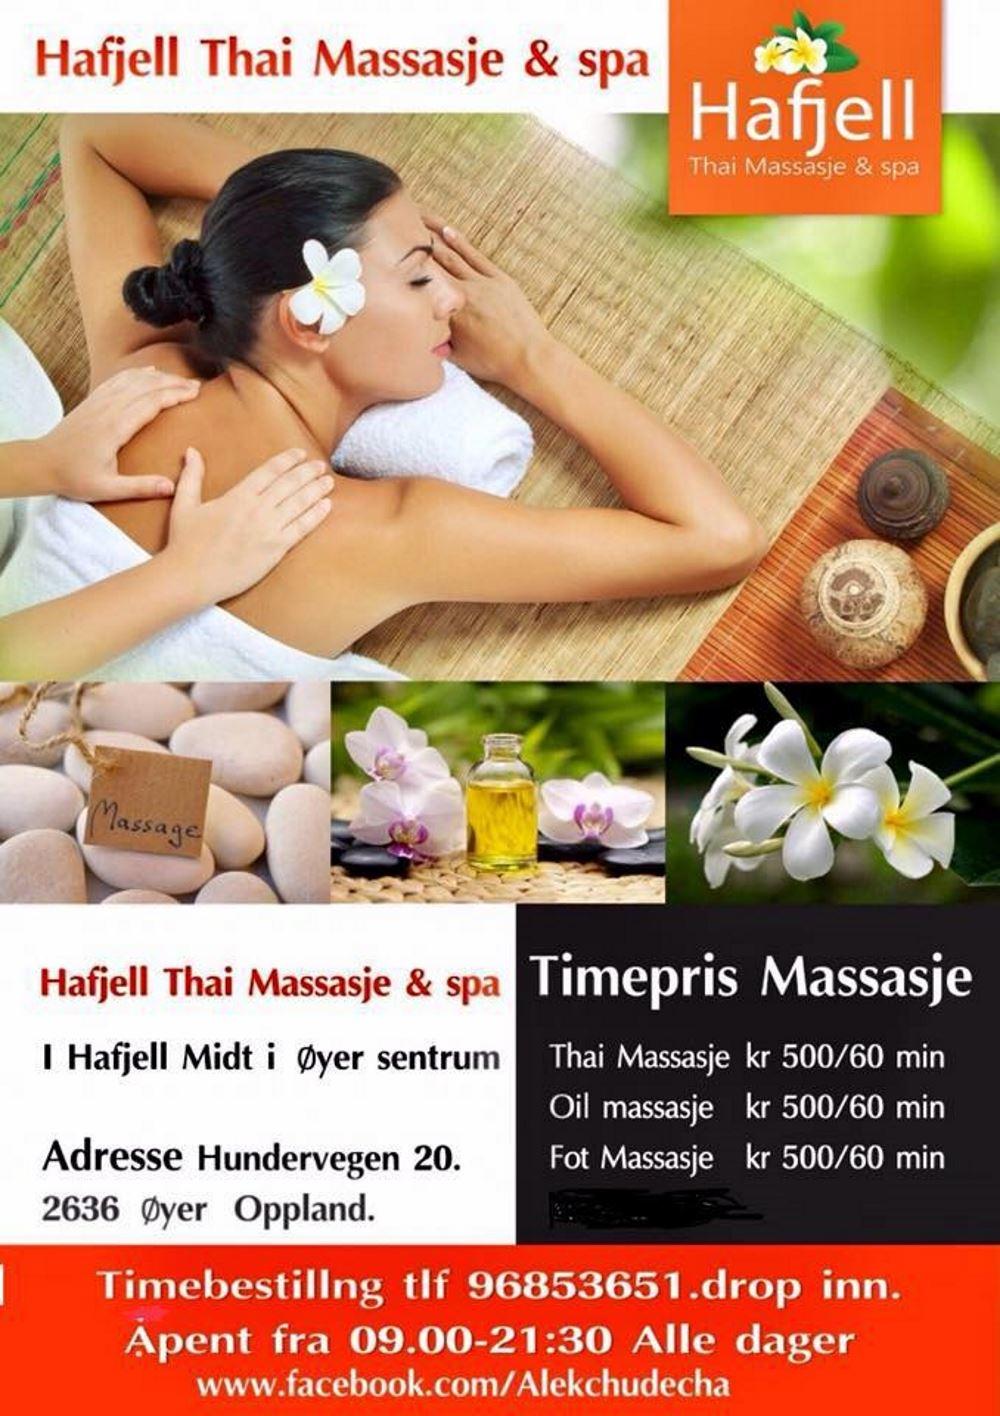 Hafjell Thai massasje & spa